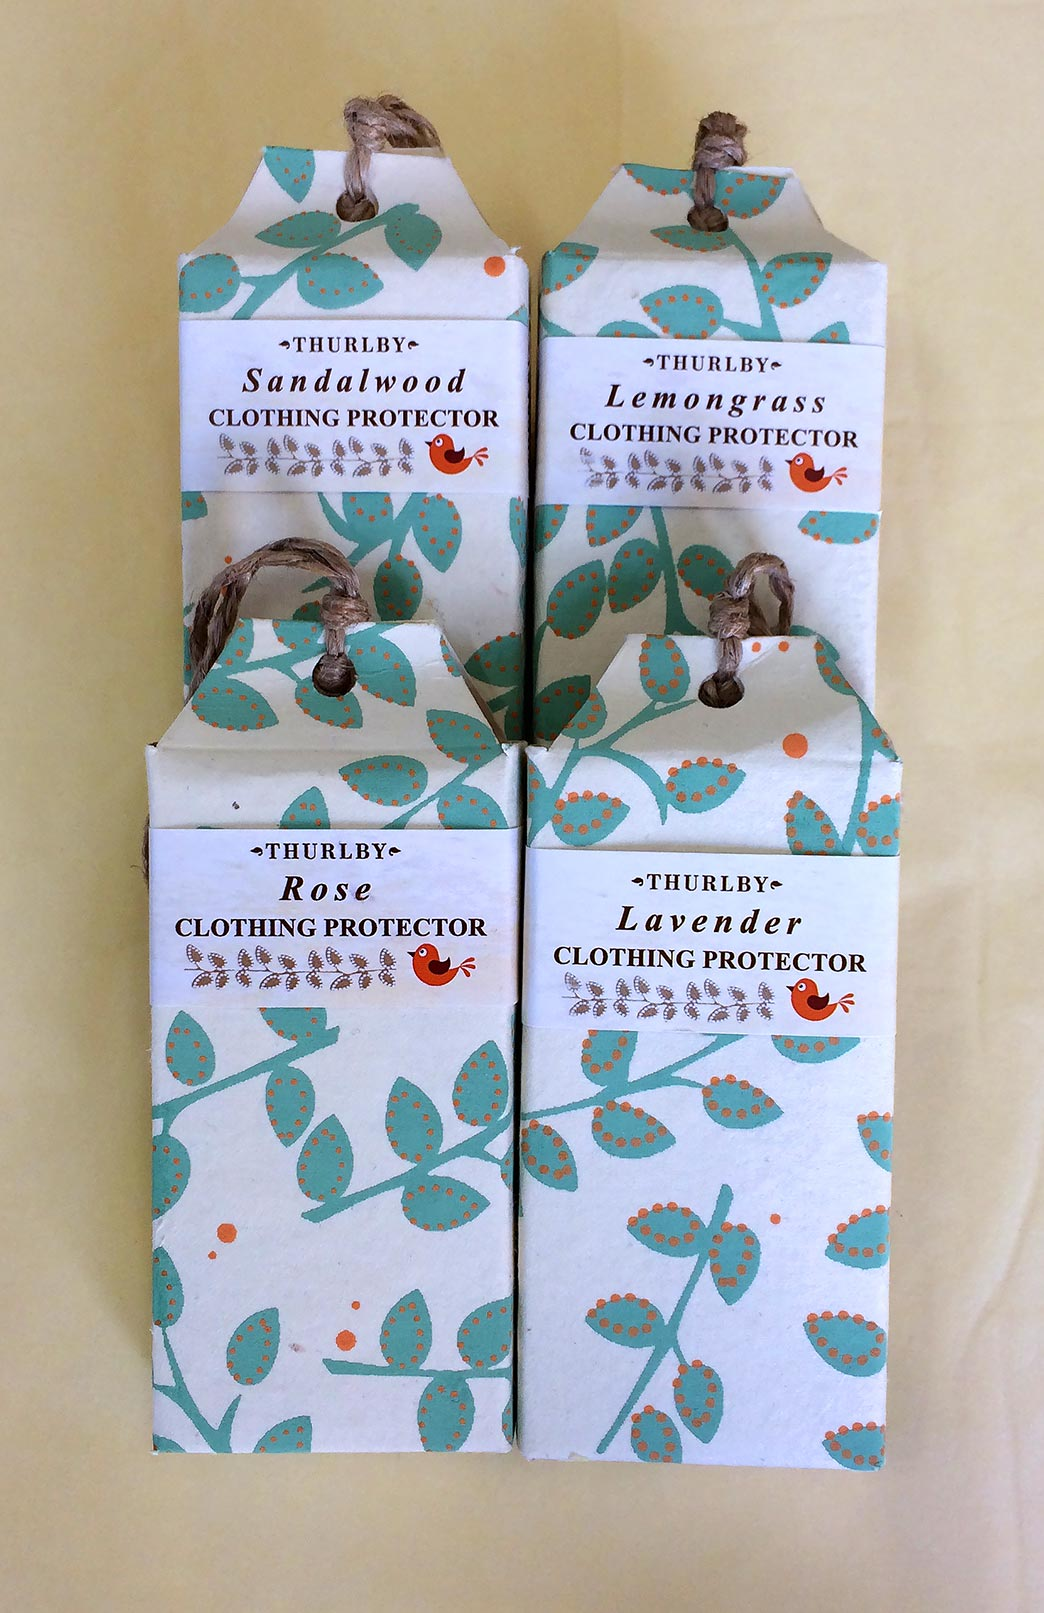 Herbal Clothing Protector - Smitten Merino Tasmania Australia